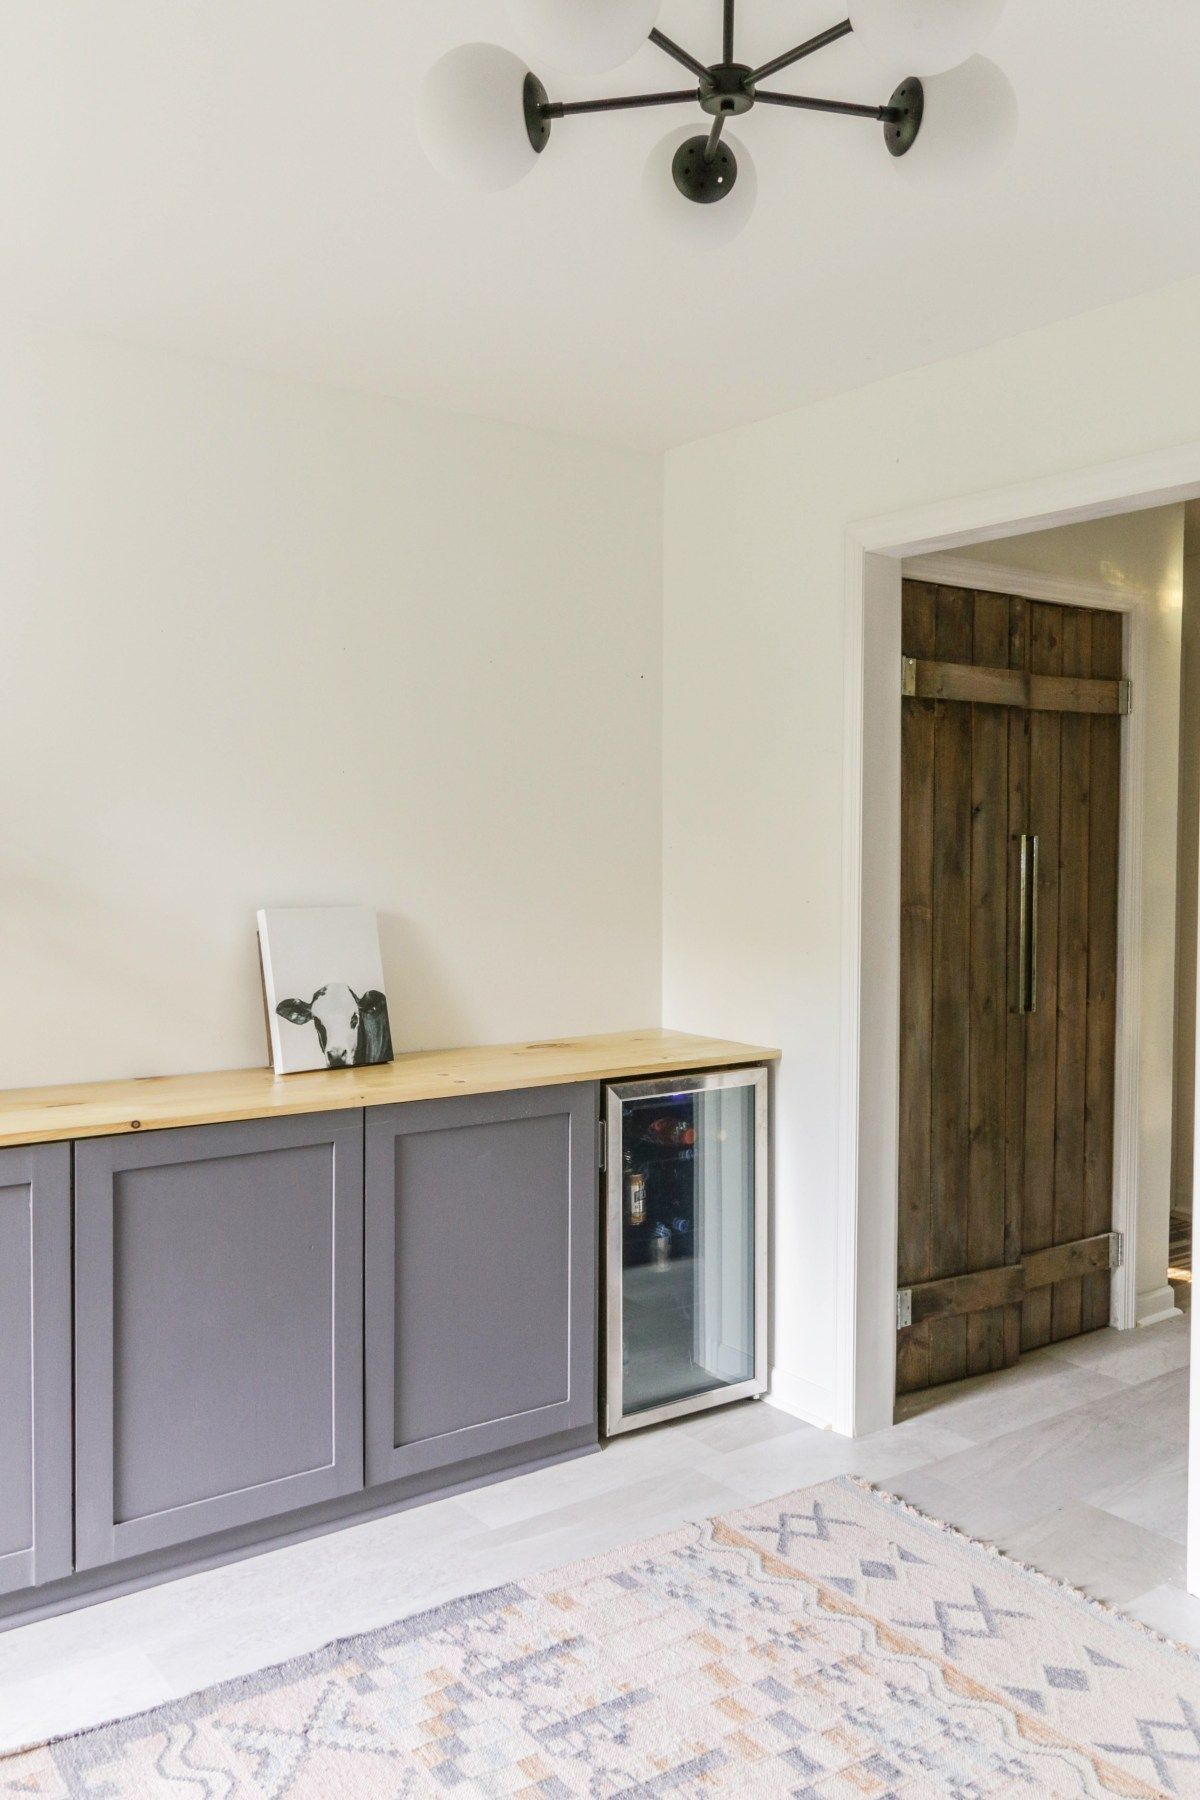 Diy wood countertops for under 50 modern farmhouse